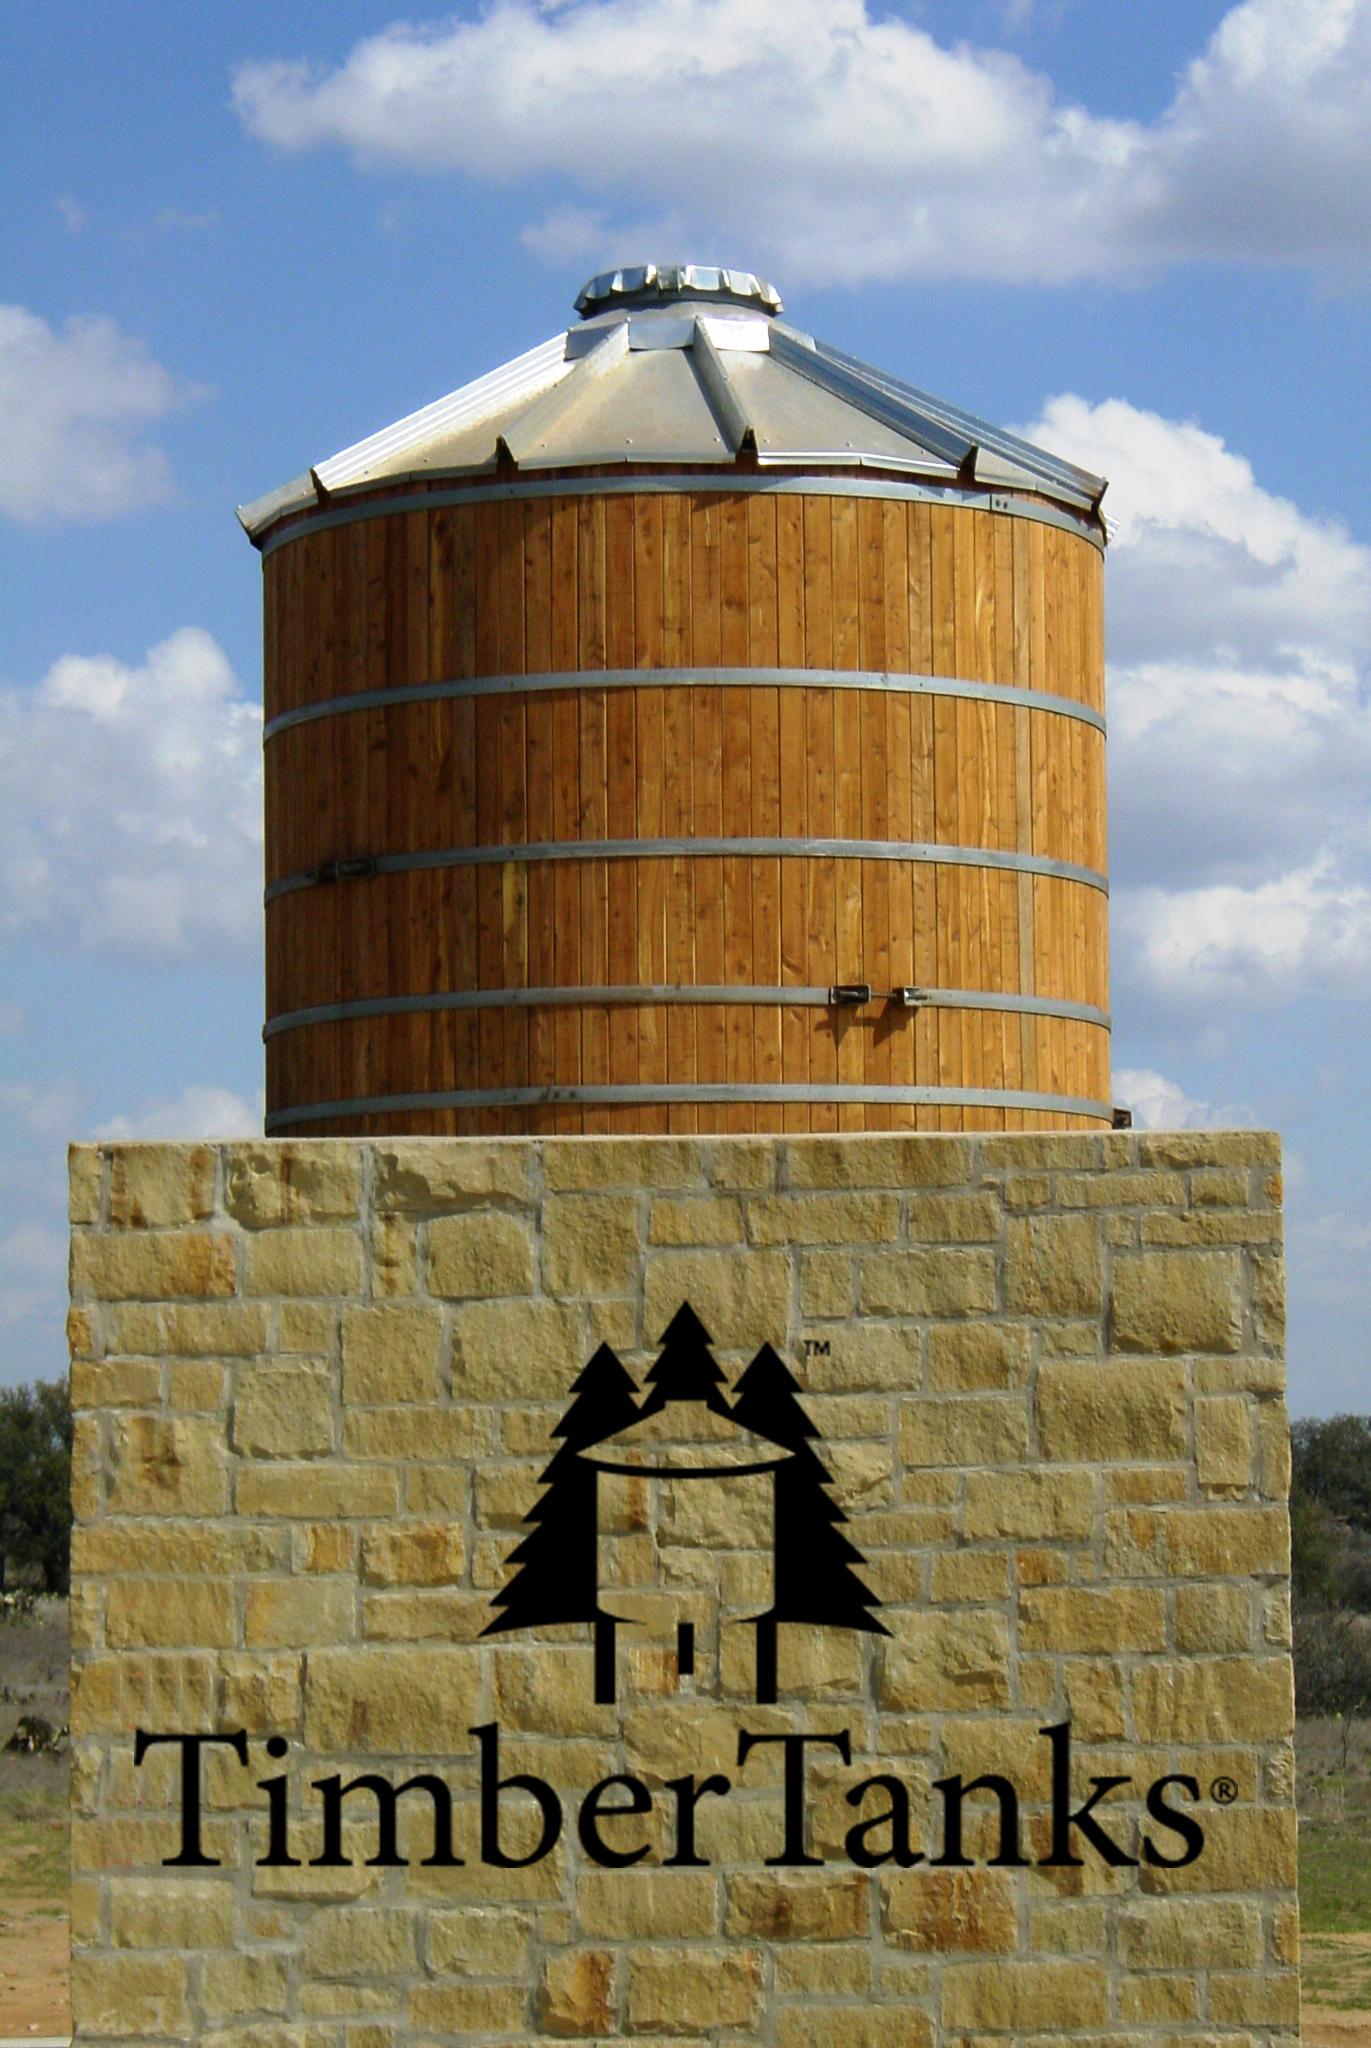 Timbertanks And Tinytimbers Water Storage Tanks Inc